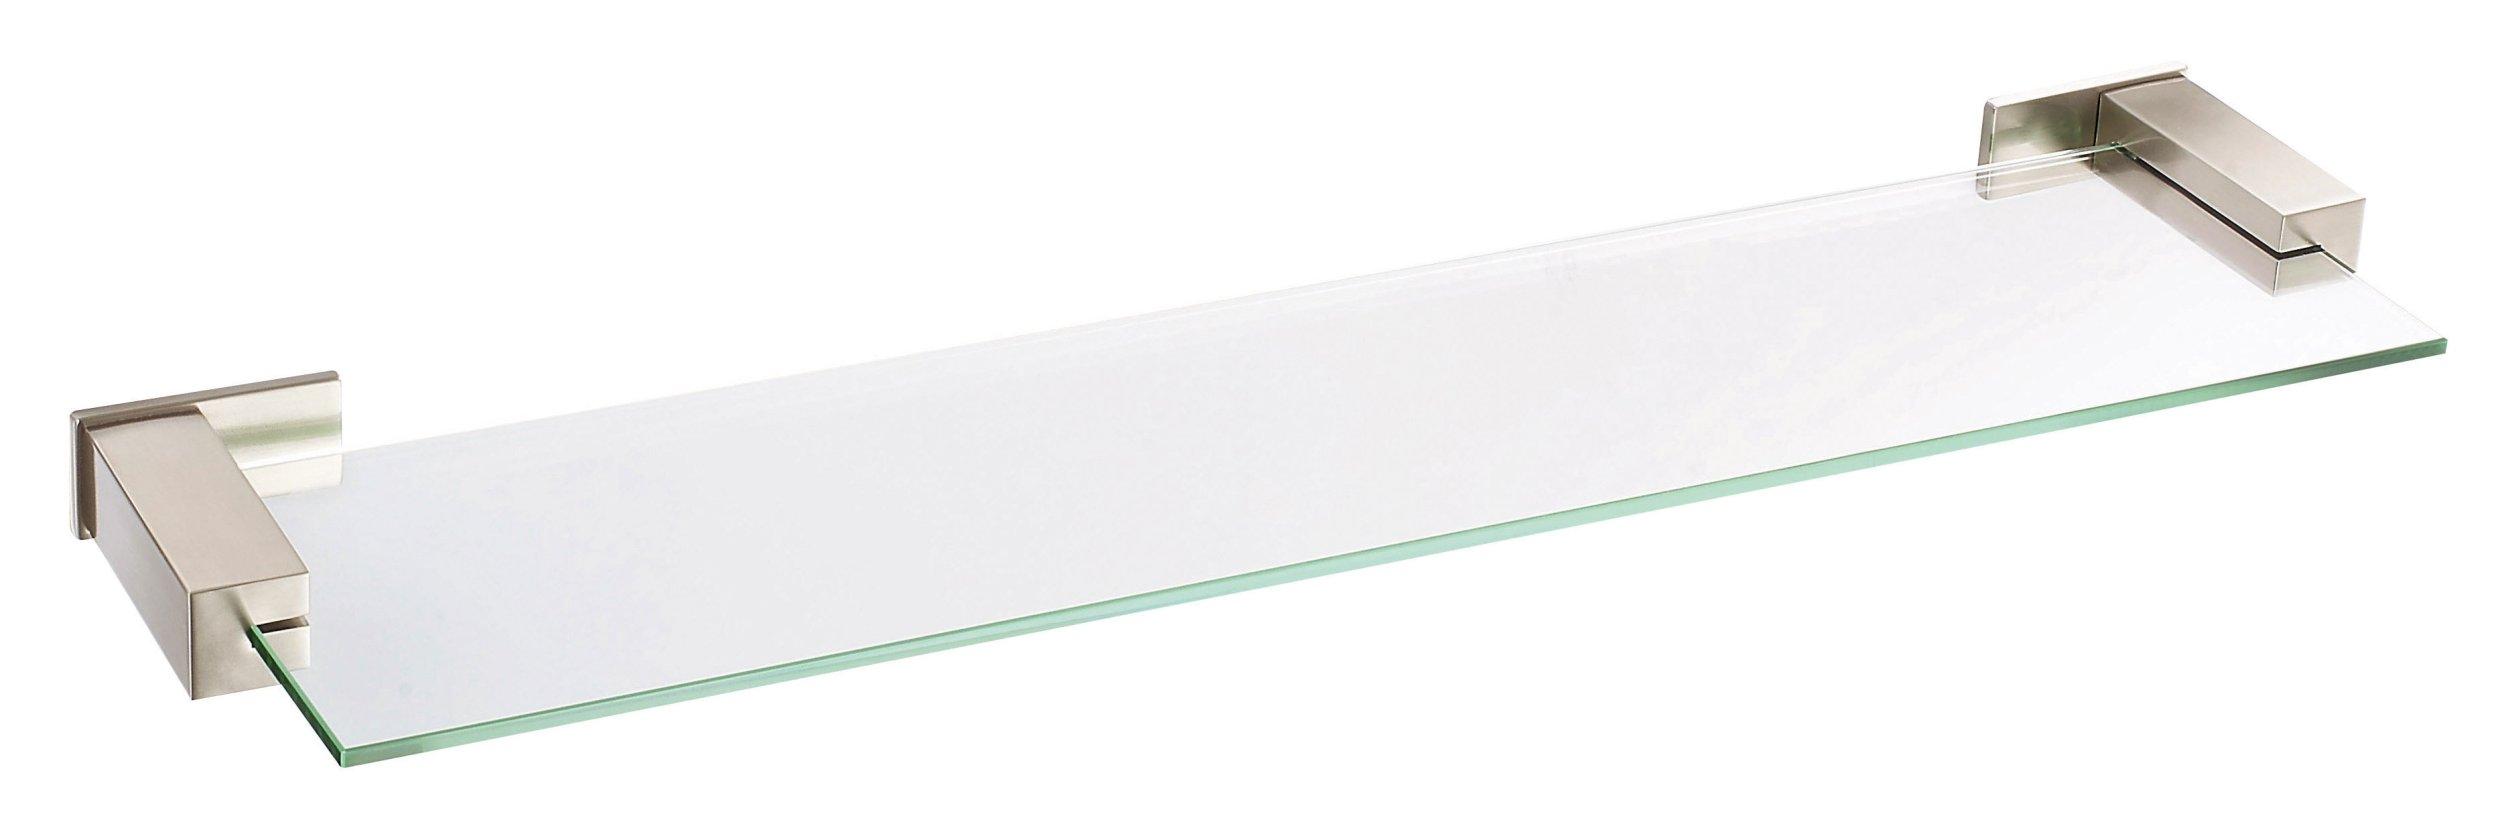 Danze D446135BN Sirius Glass Shelf, 24-Inch, Brushed Nickel